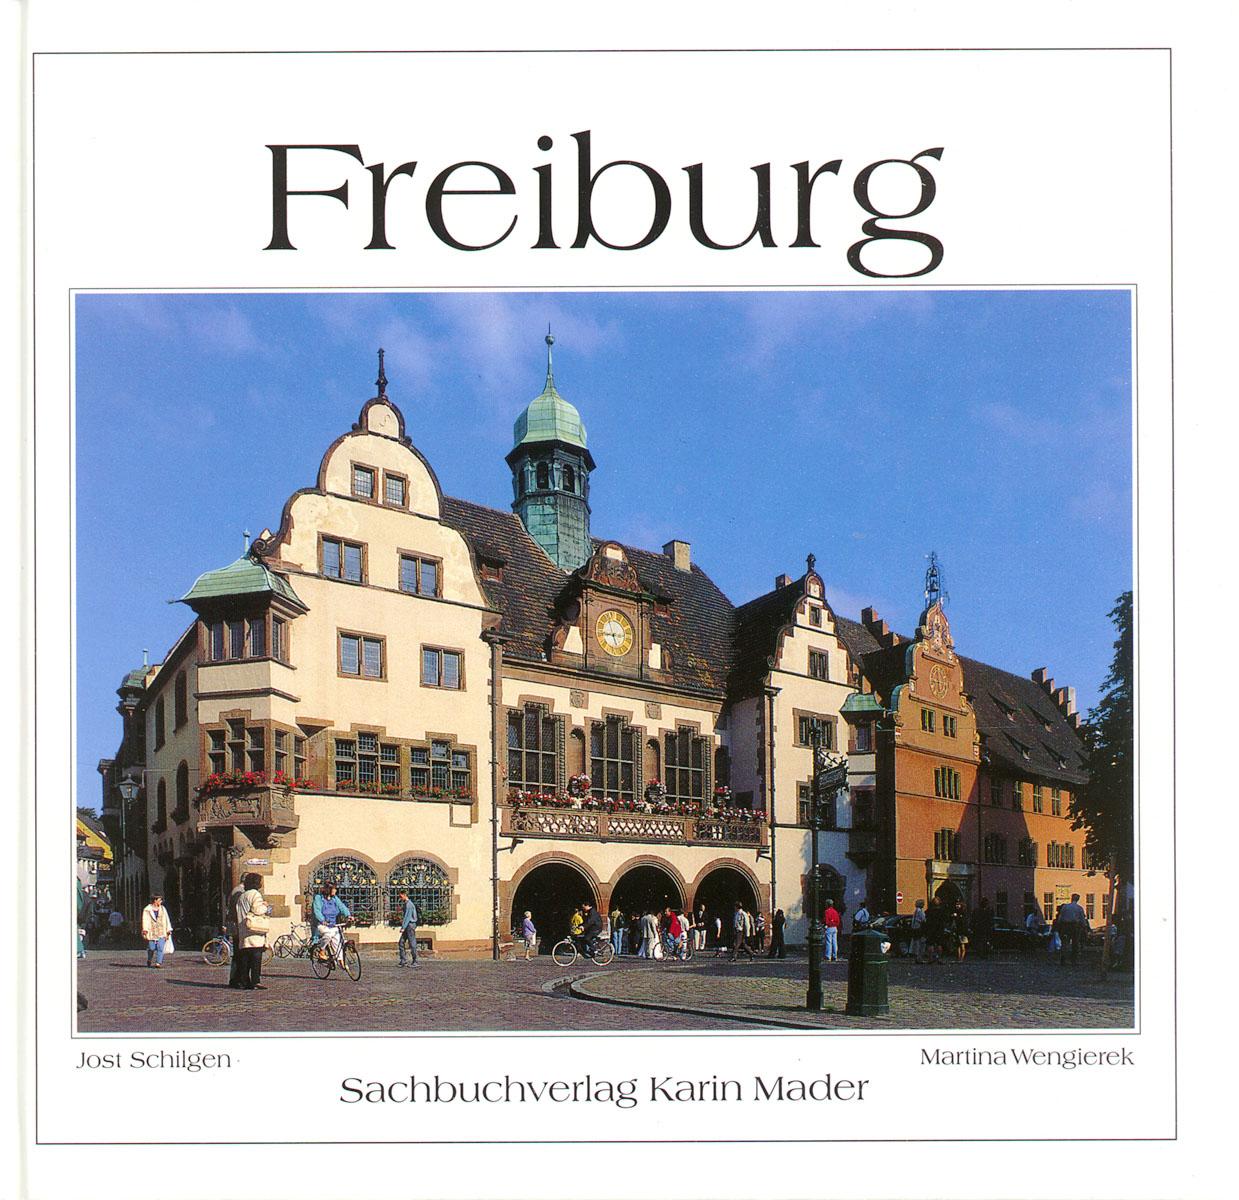 http://mader-verlag.de/books/freiburg/freiburg_hires.jpg